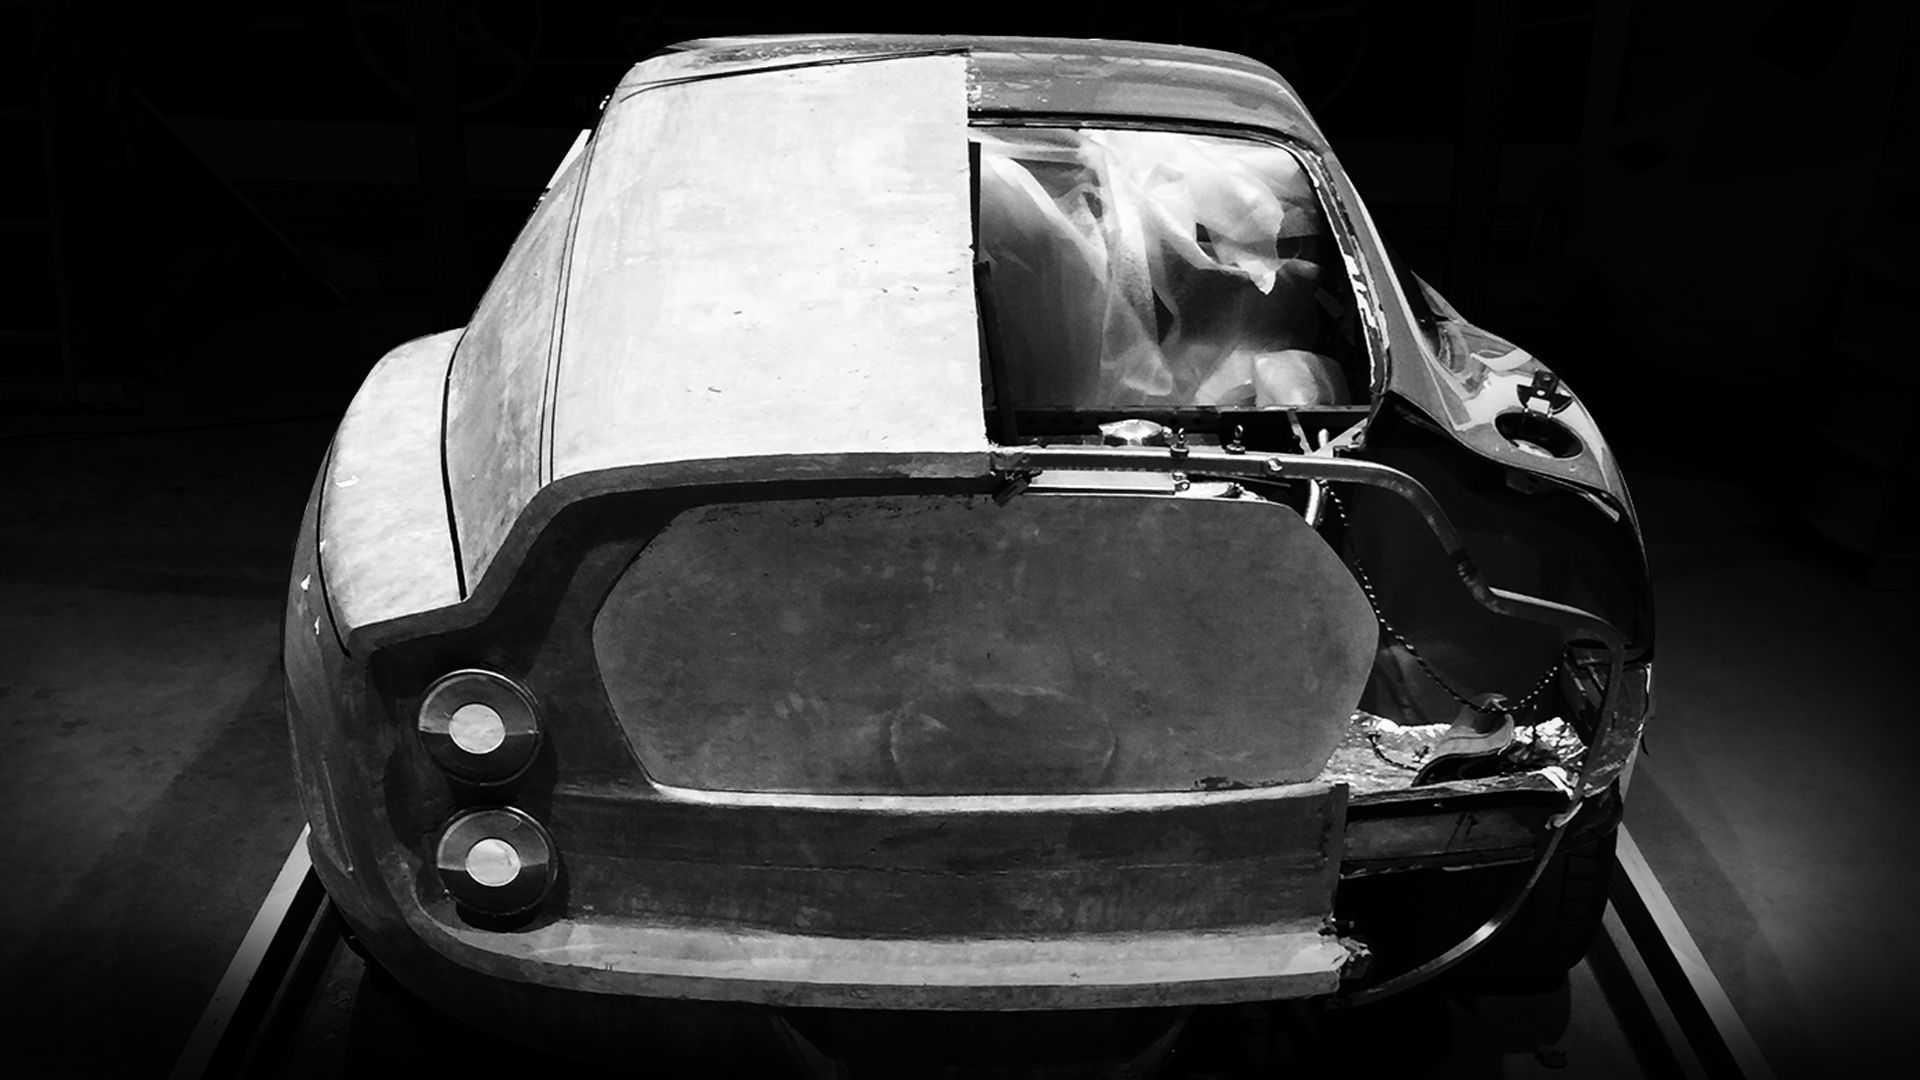 Ferrari-250-GT-Drogo-Breadvan-Hommage-29